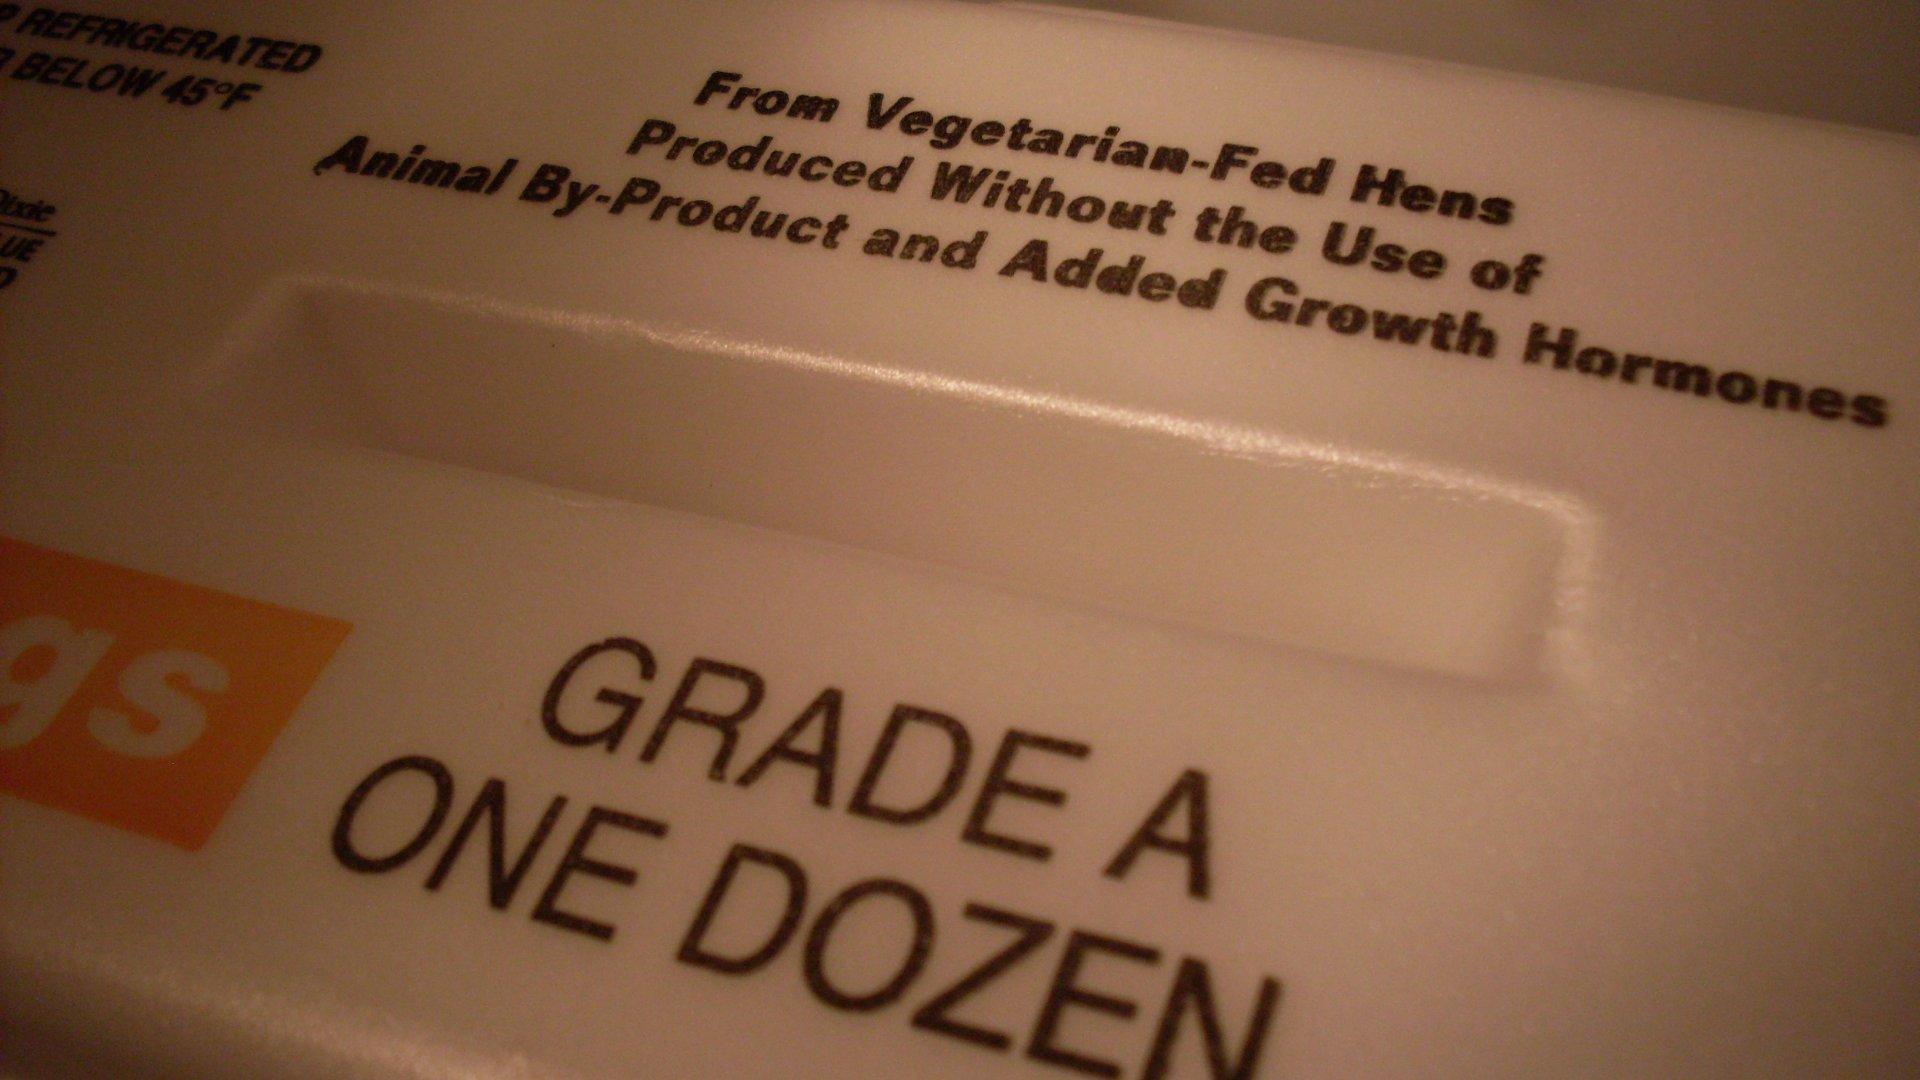 1 dozen growth hormone-free eggs